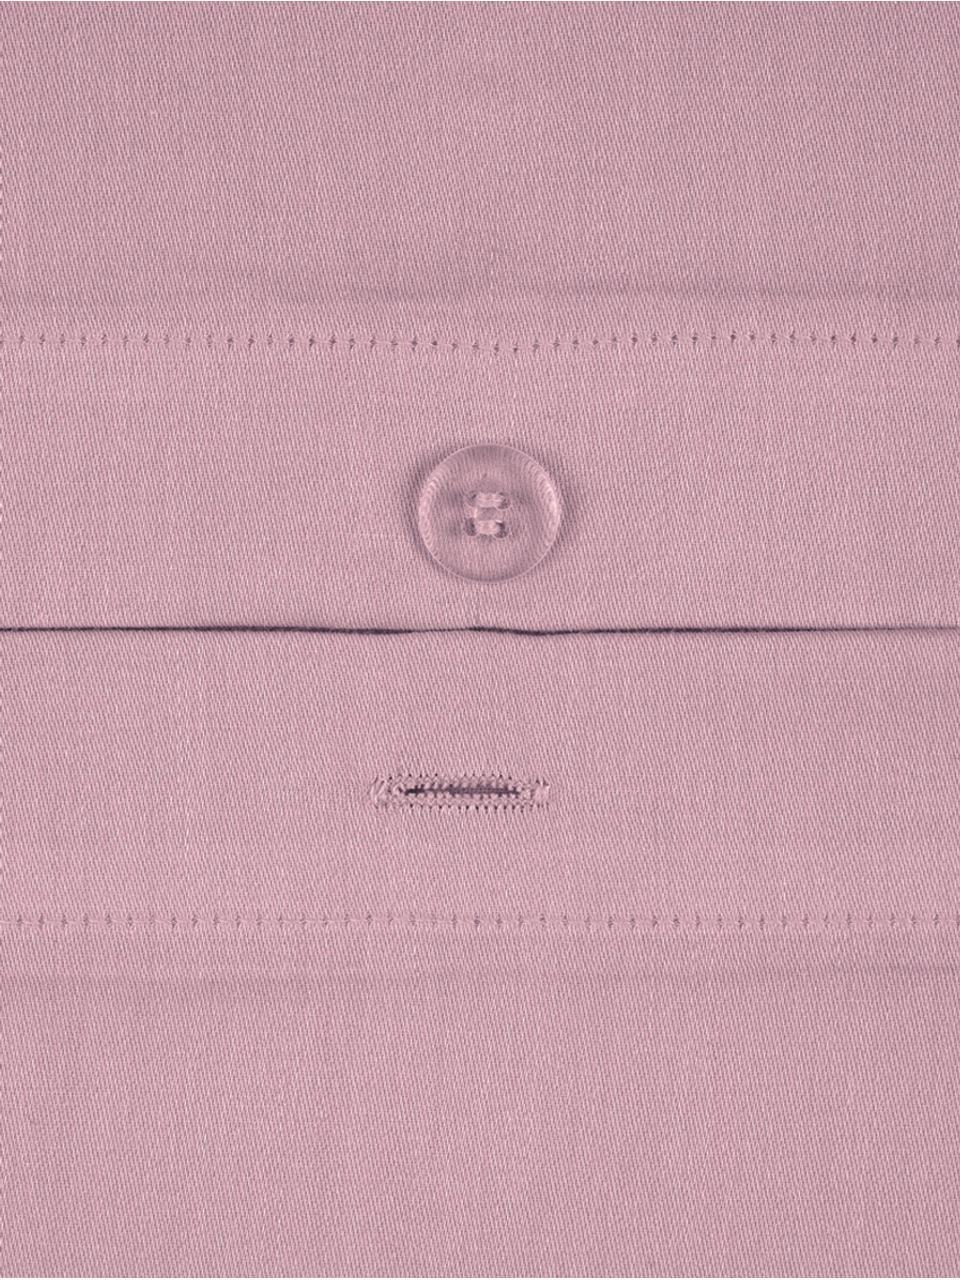 Baumwollsatin-Kissenbezüge Comfort in Mauve, 2 Stück, Webart: Satin Fadendichte 250 TC,, Mauve, 40 x 80 cm